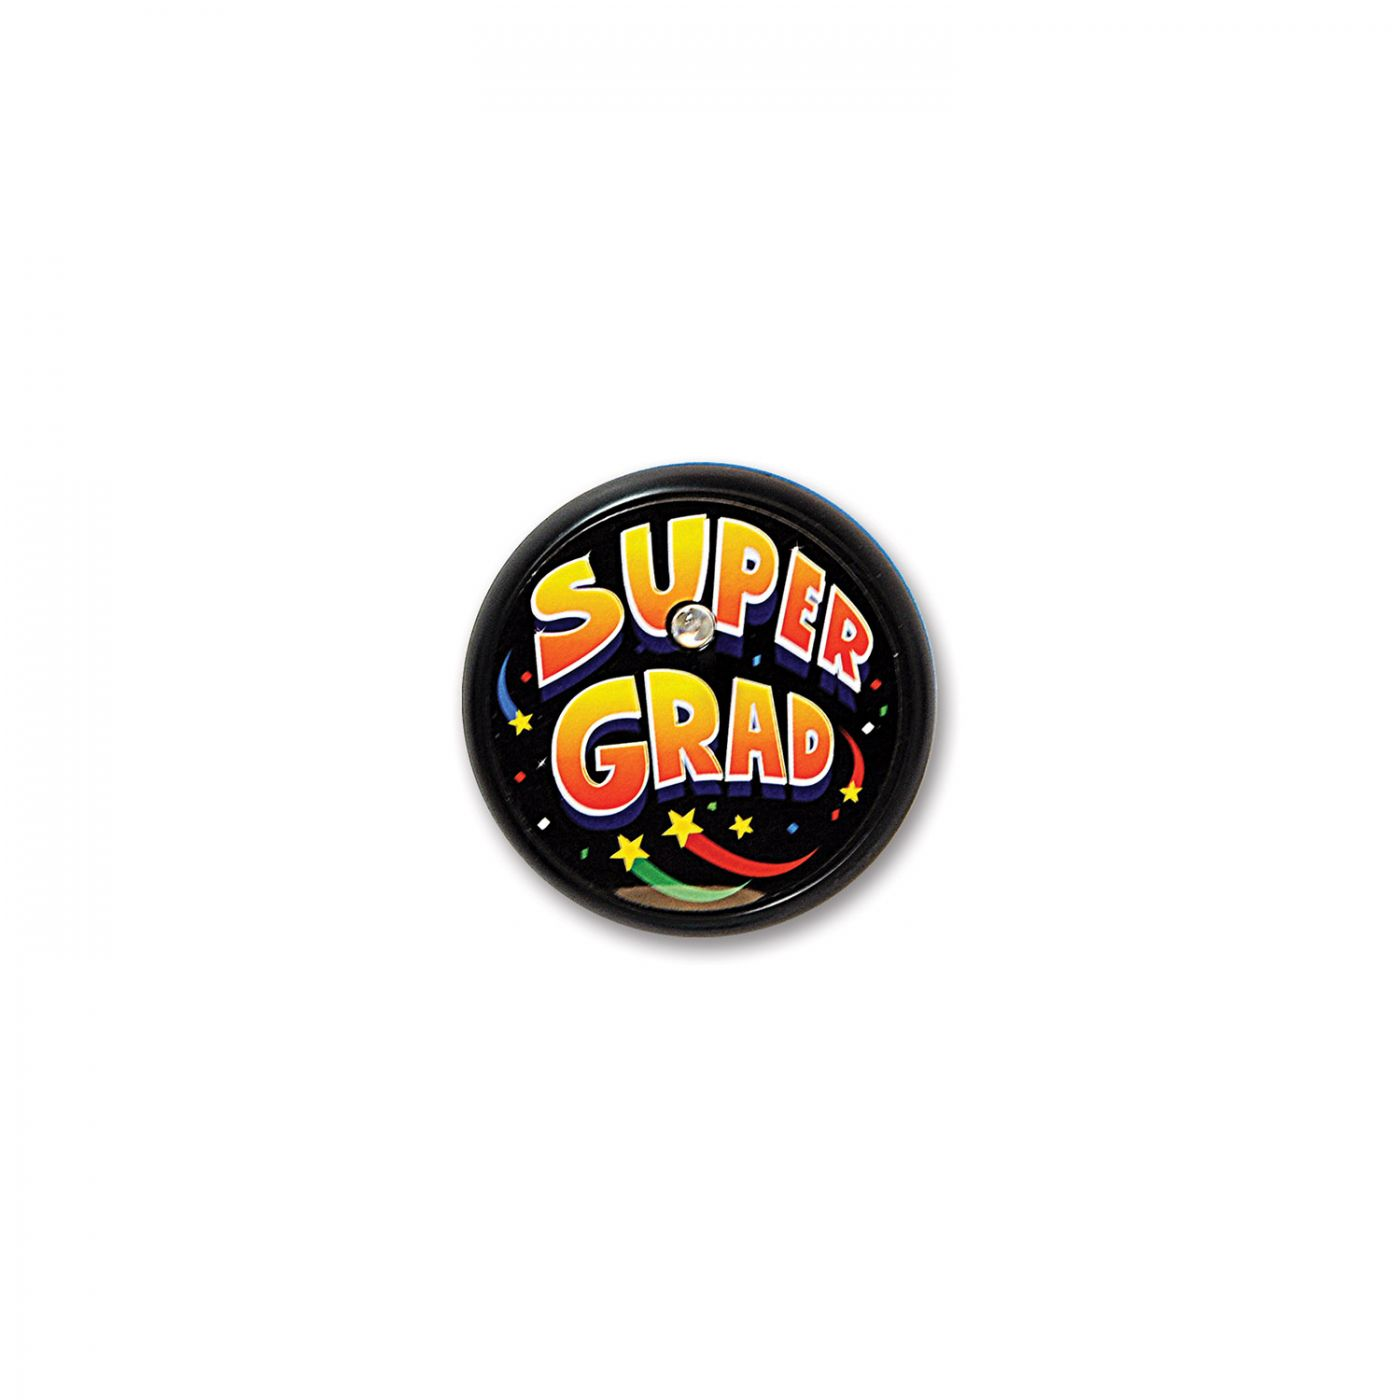 Super Grad Blinking Button (6) image